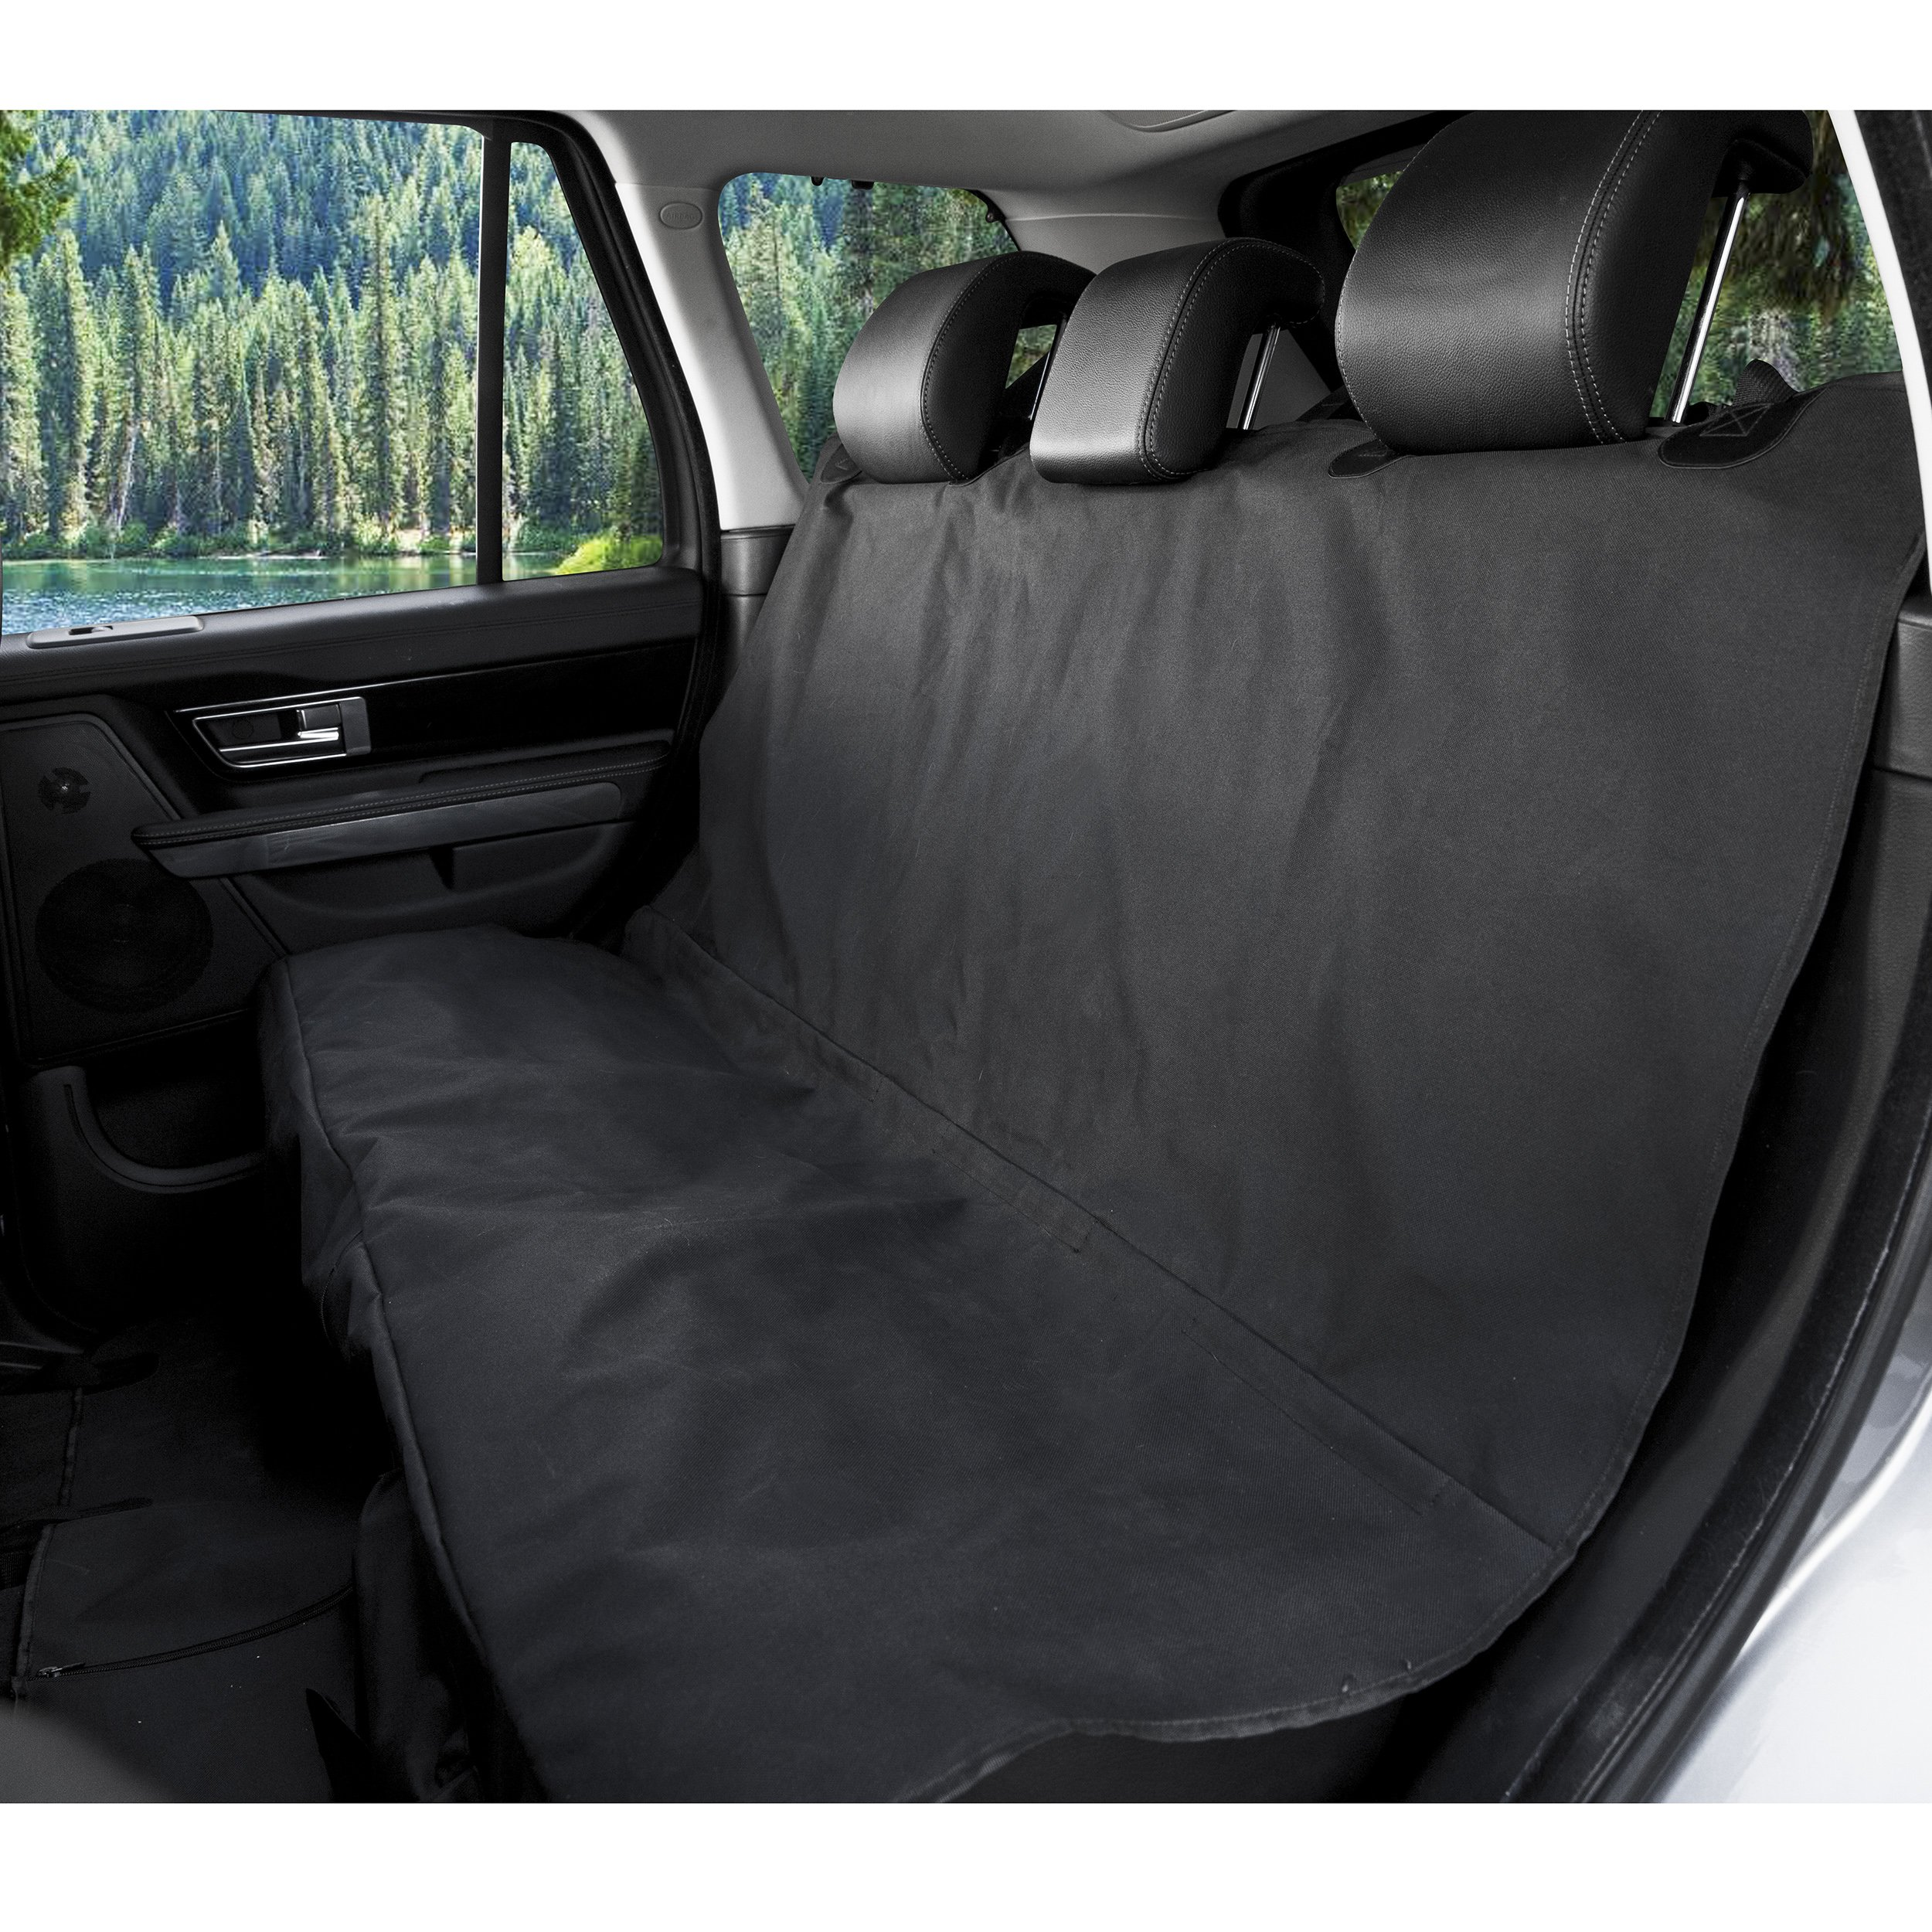 Barksbar Original Pet Seat Cover For Cars Black